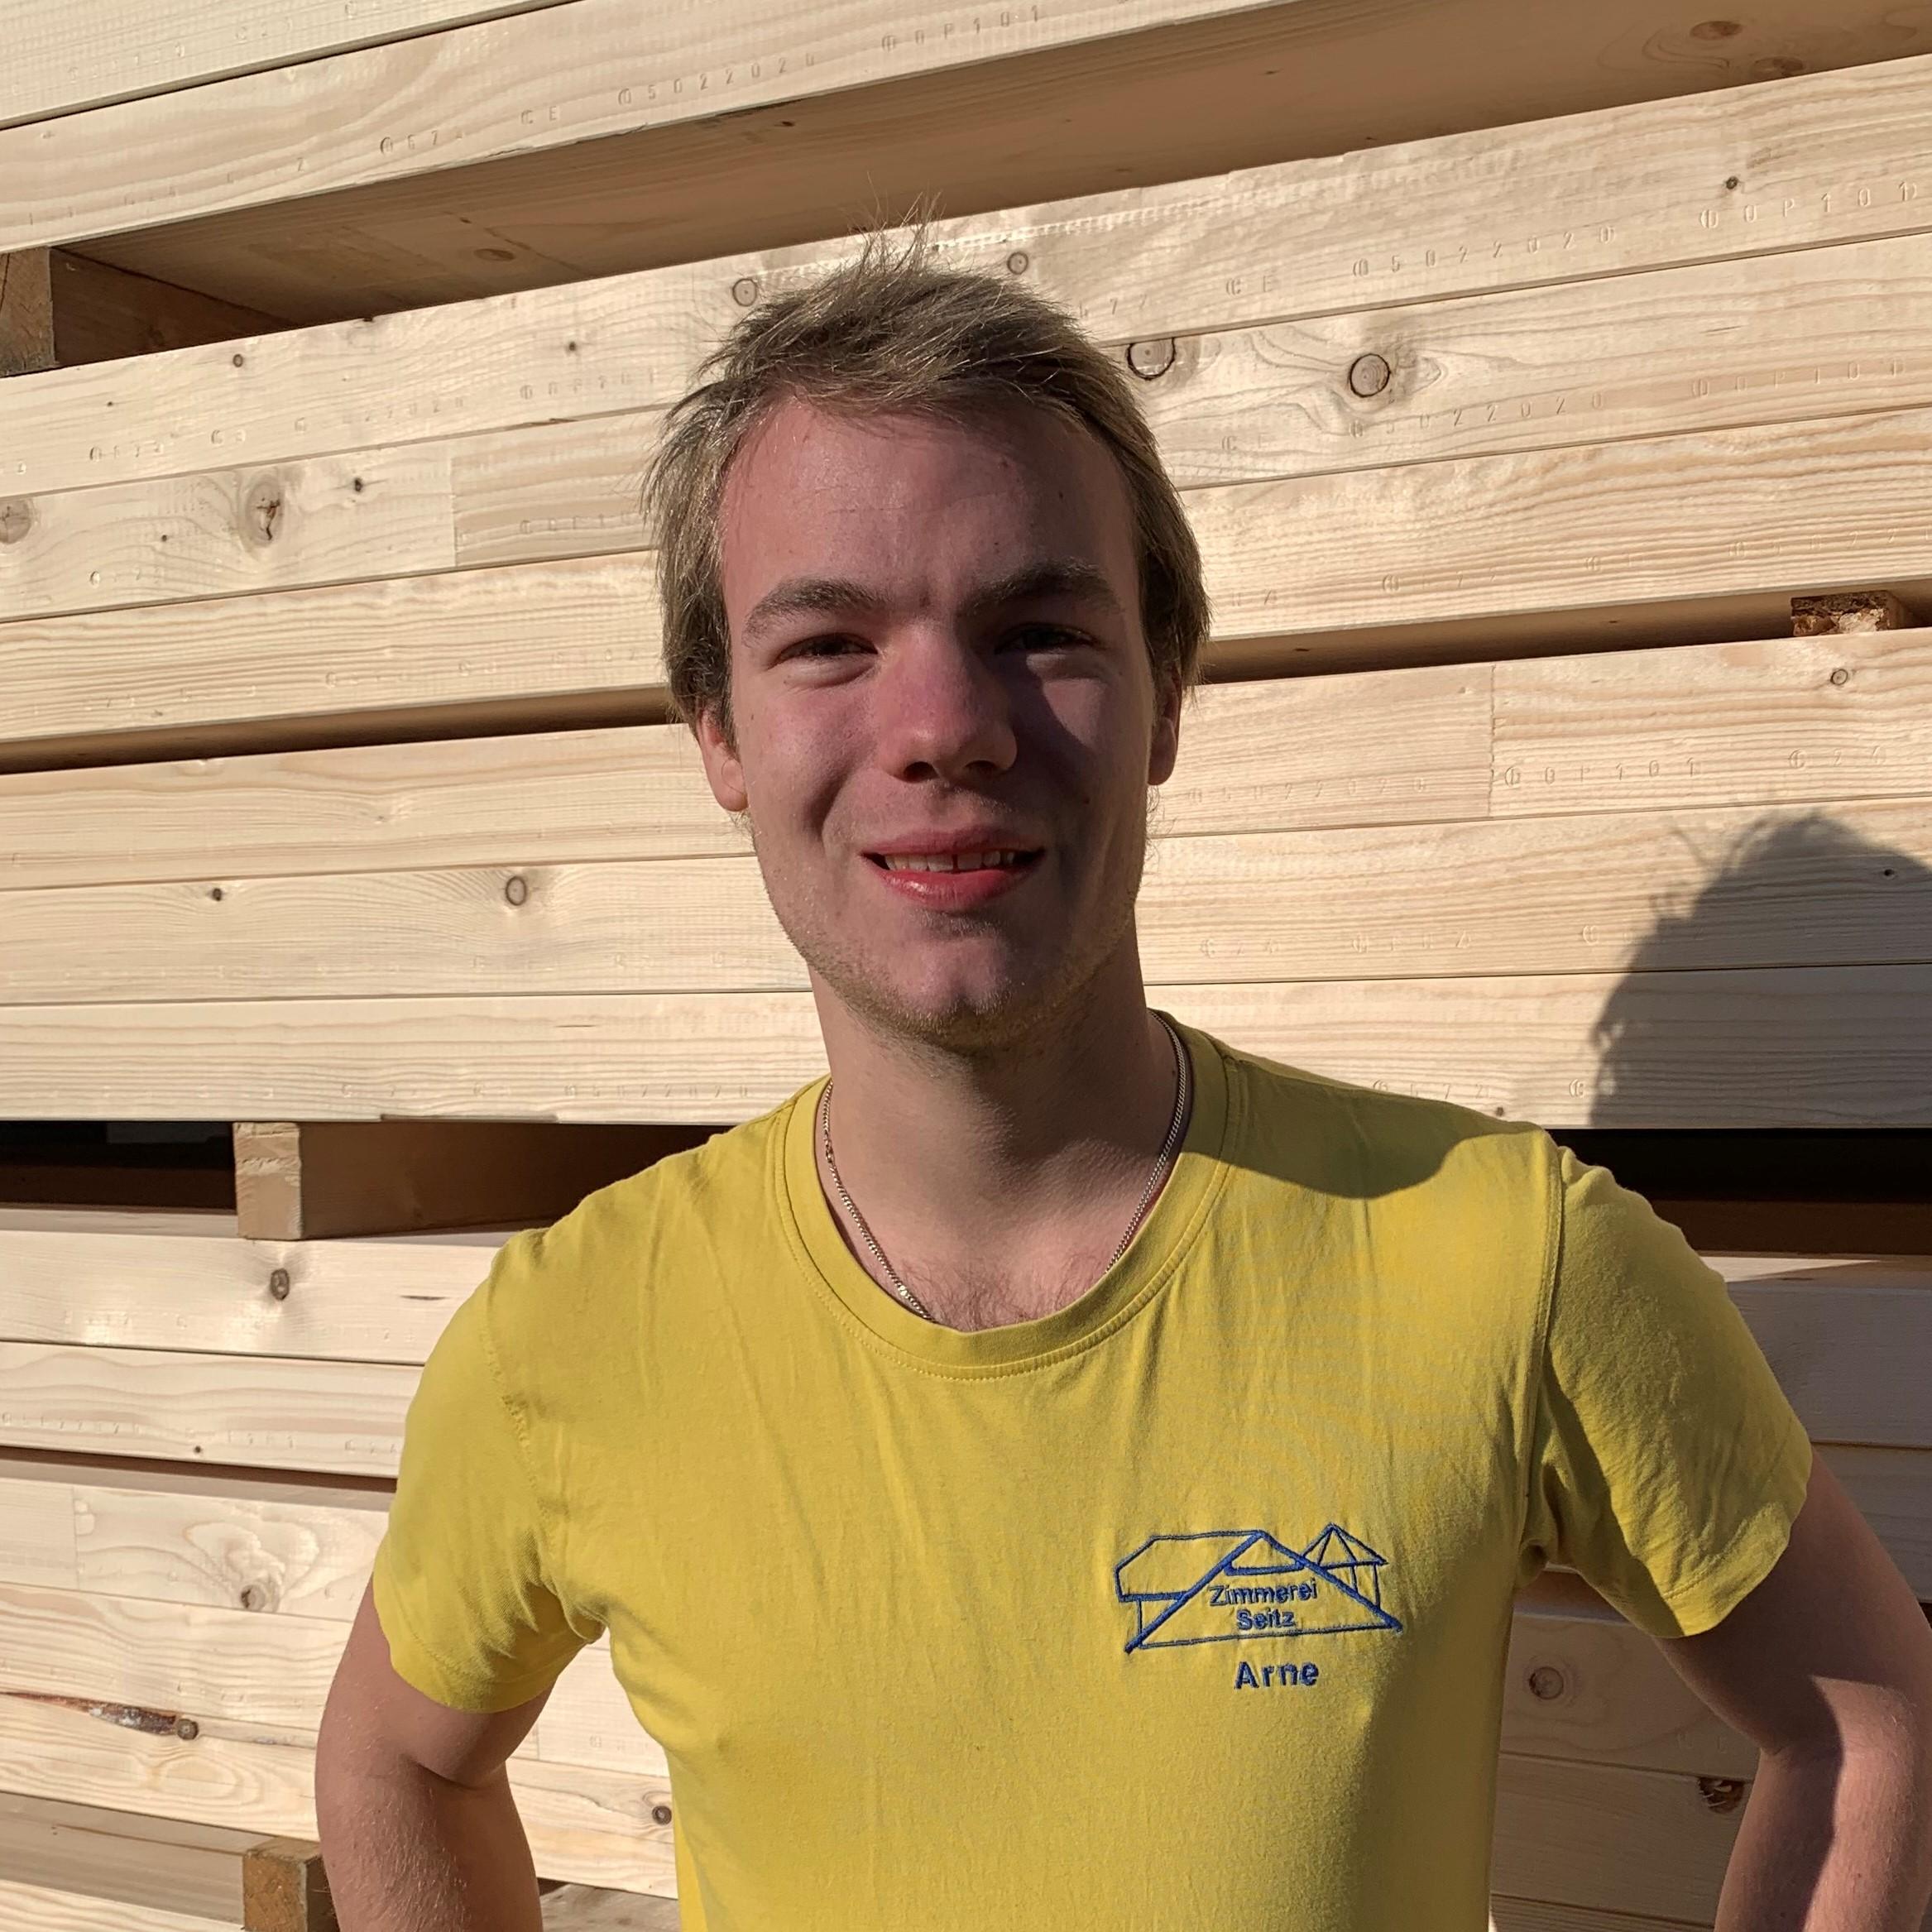 Arne Raufeisen